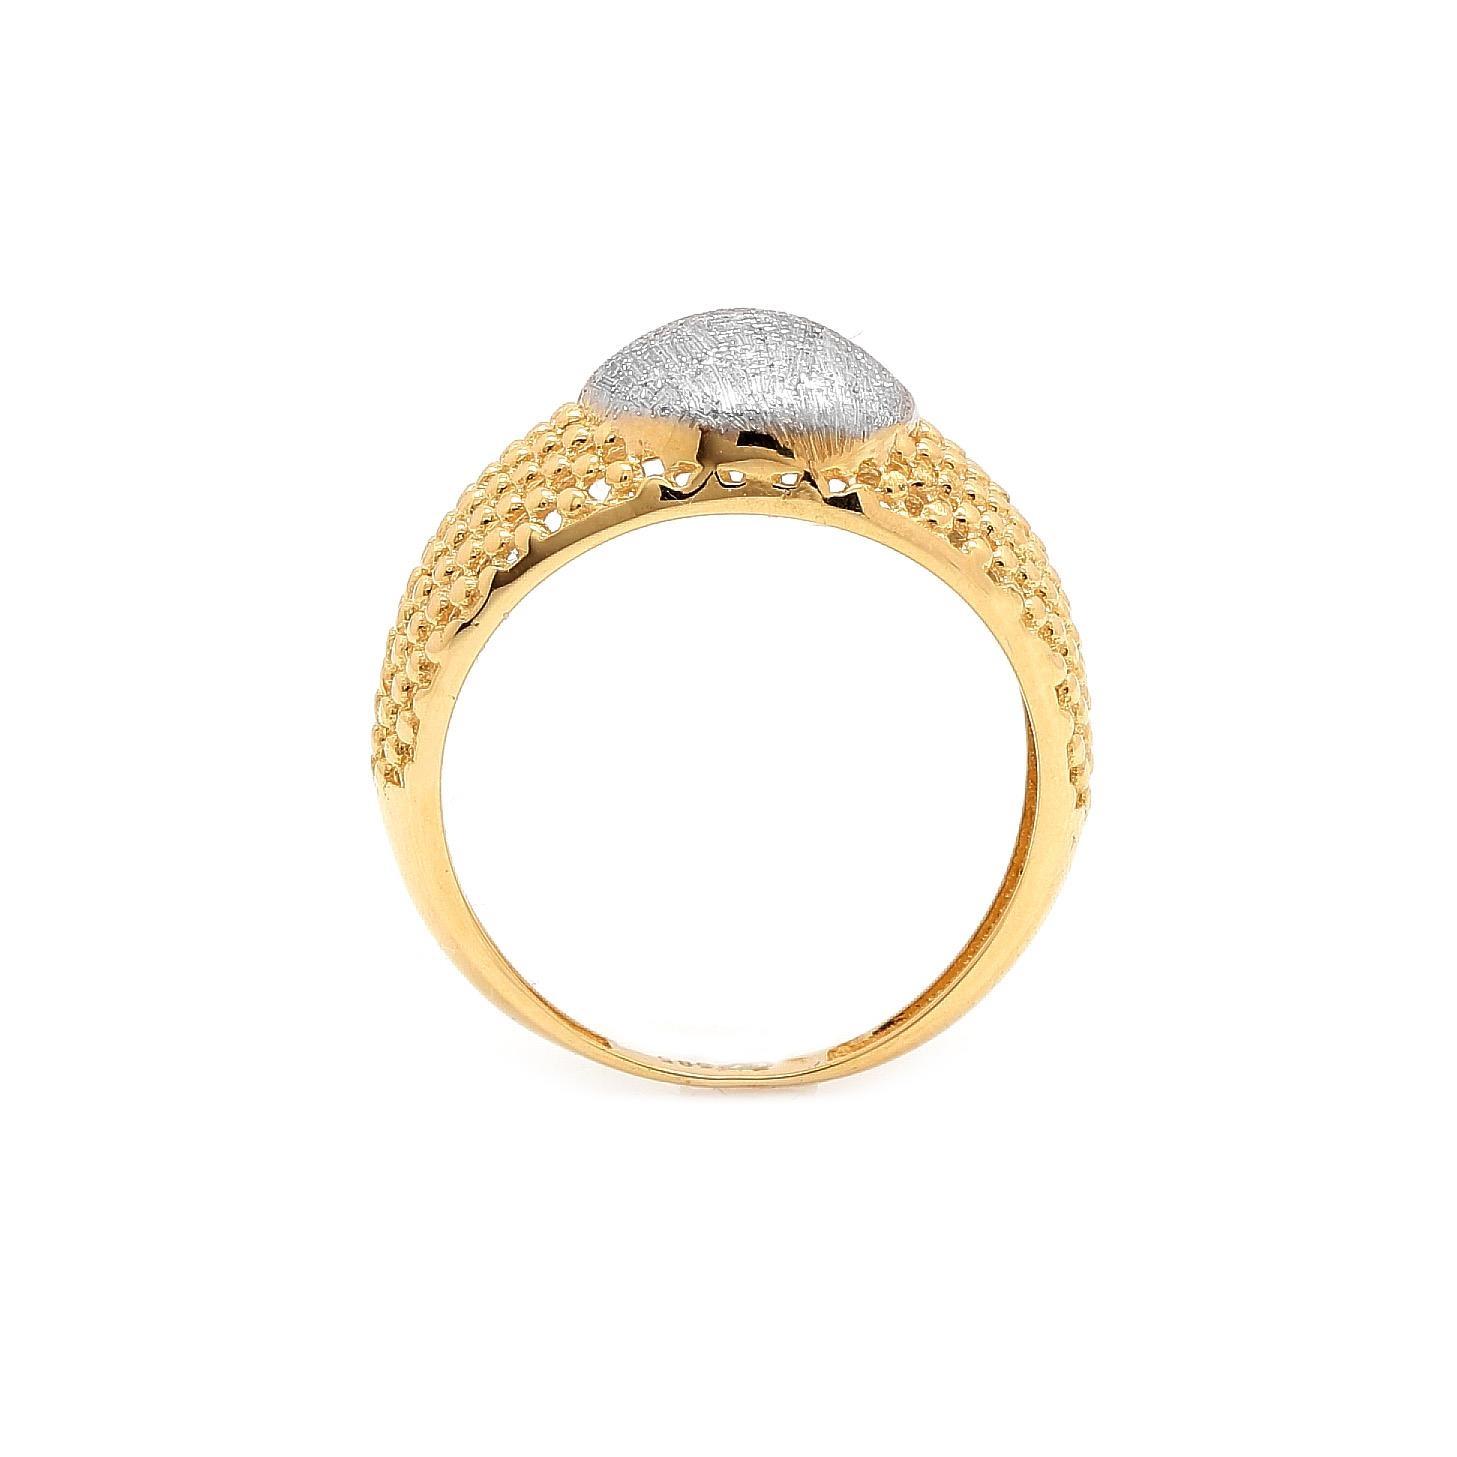 ... zlatý prsteň apolline 2 272e9adc3cd